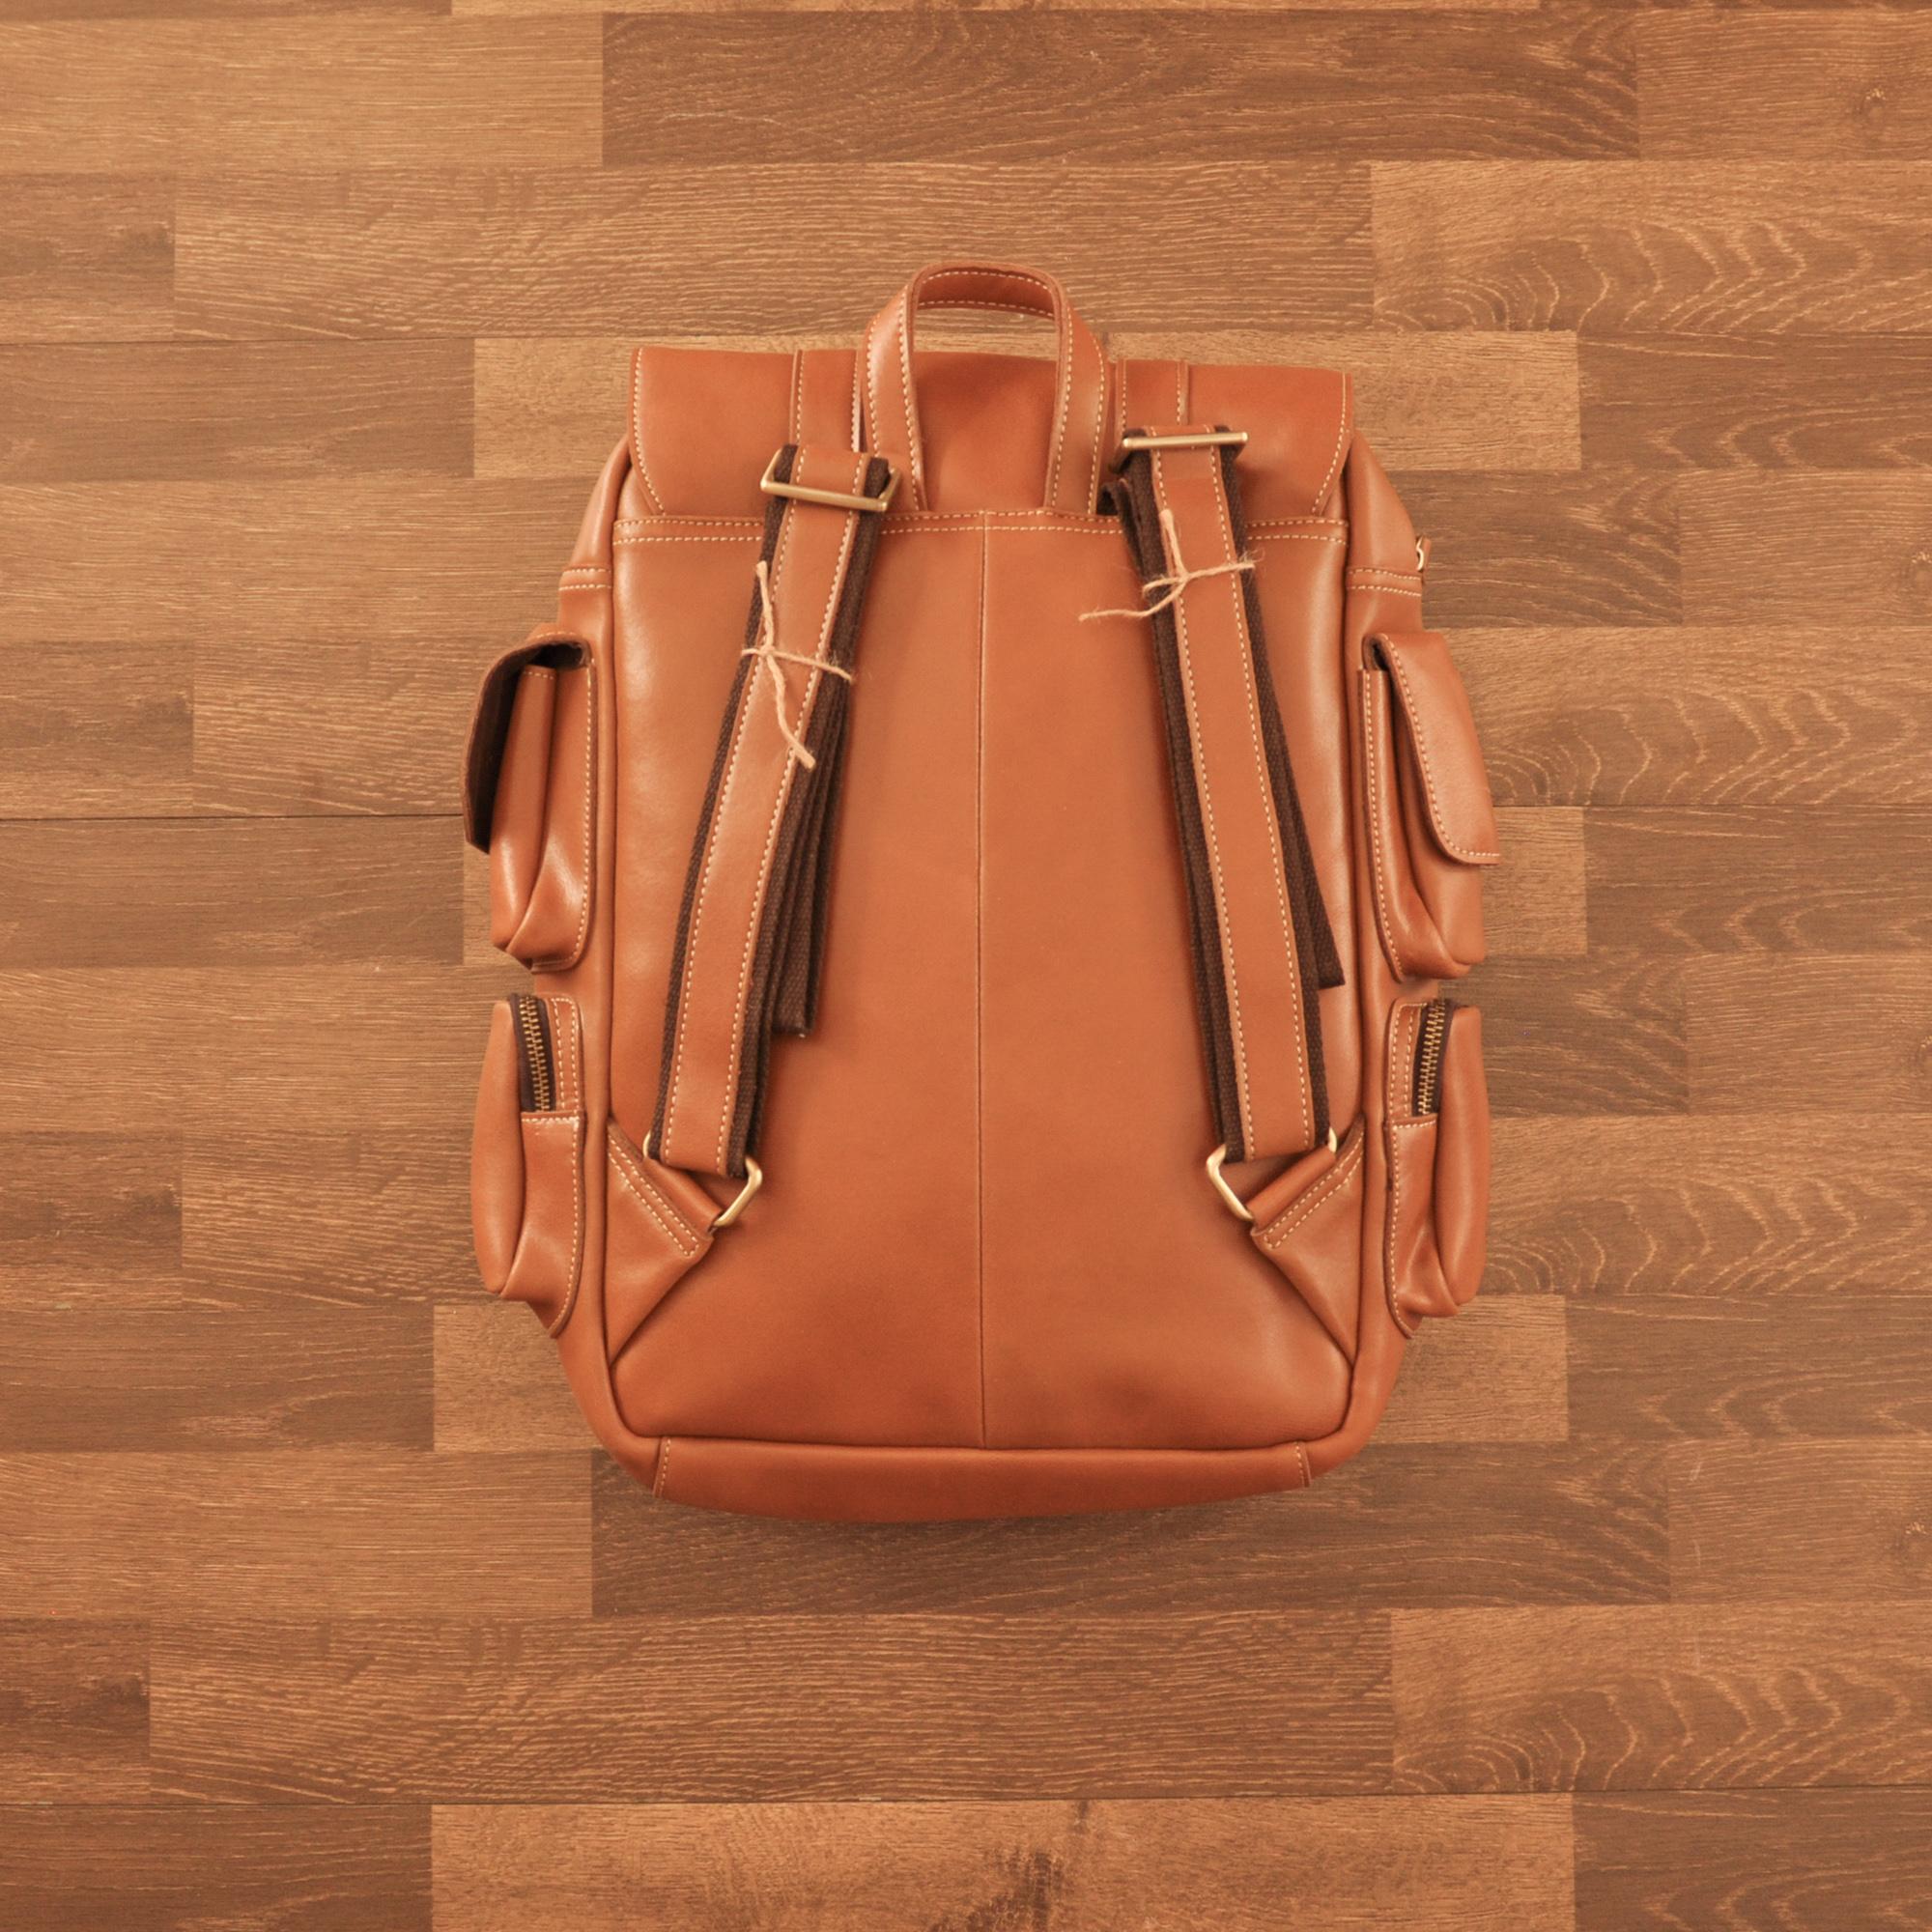 Model 6 - Tan - Back